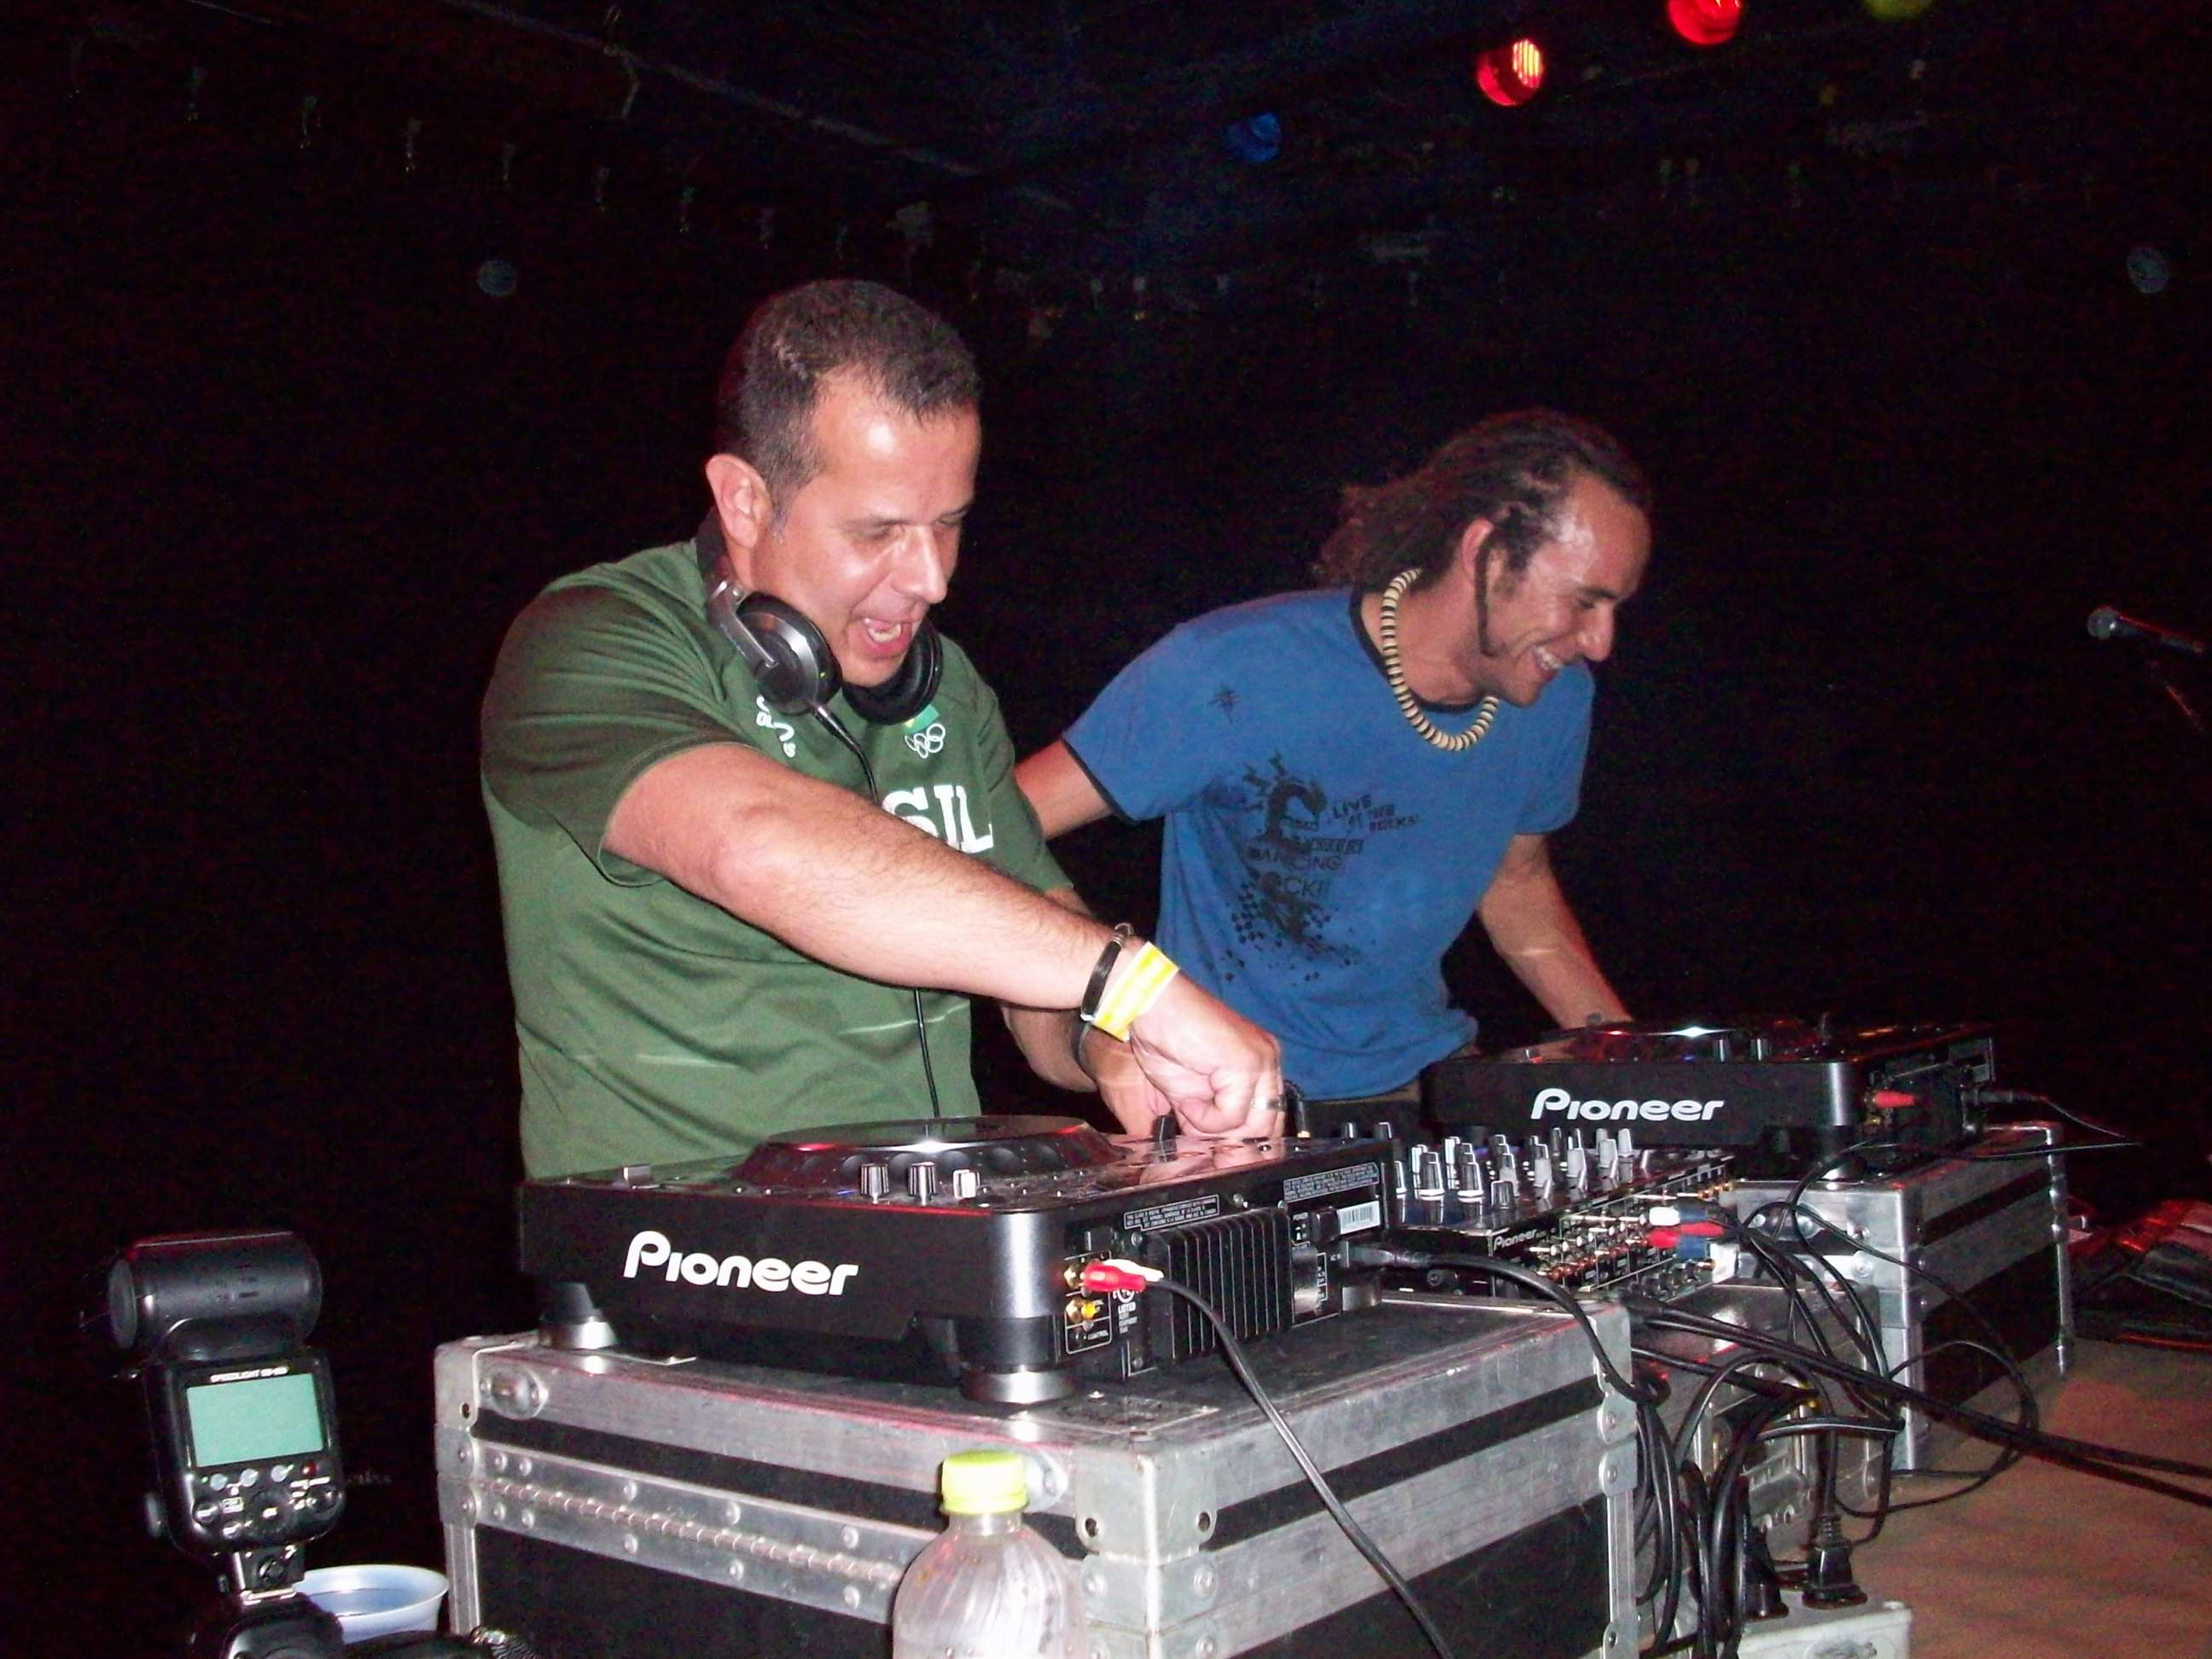 os-DJs-Branko-e-Raul-Vax-no-Expressions-of-Brazil-100_2597